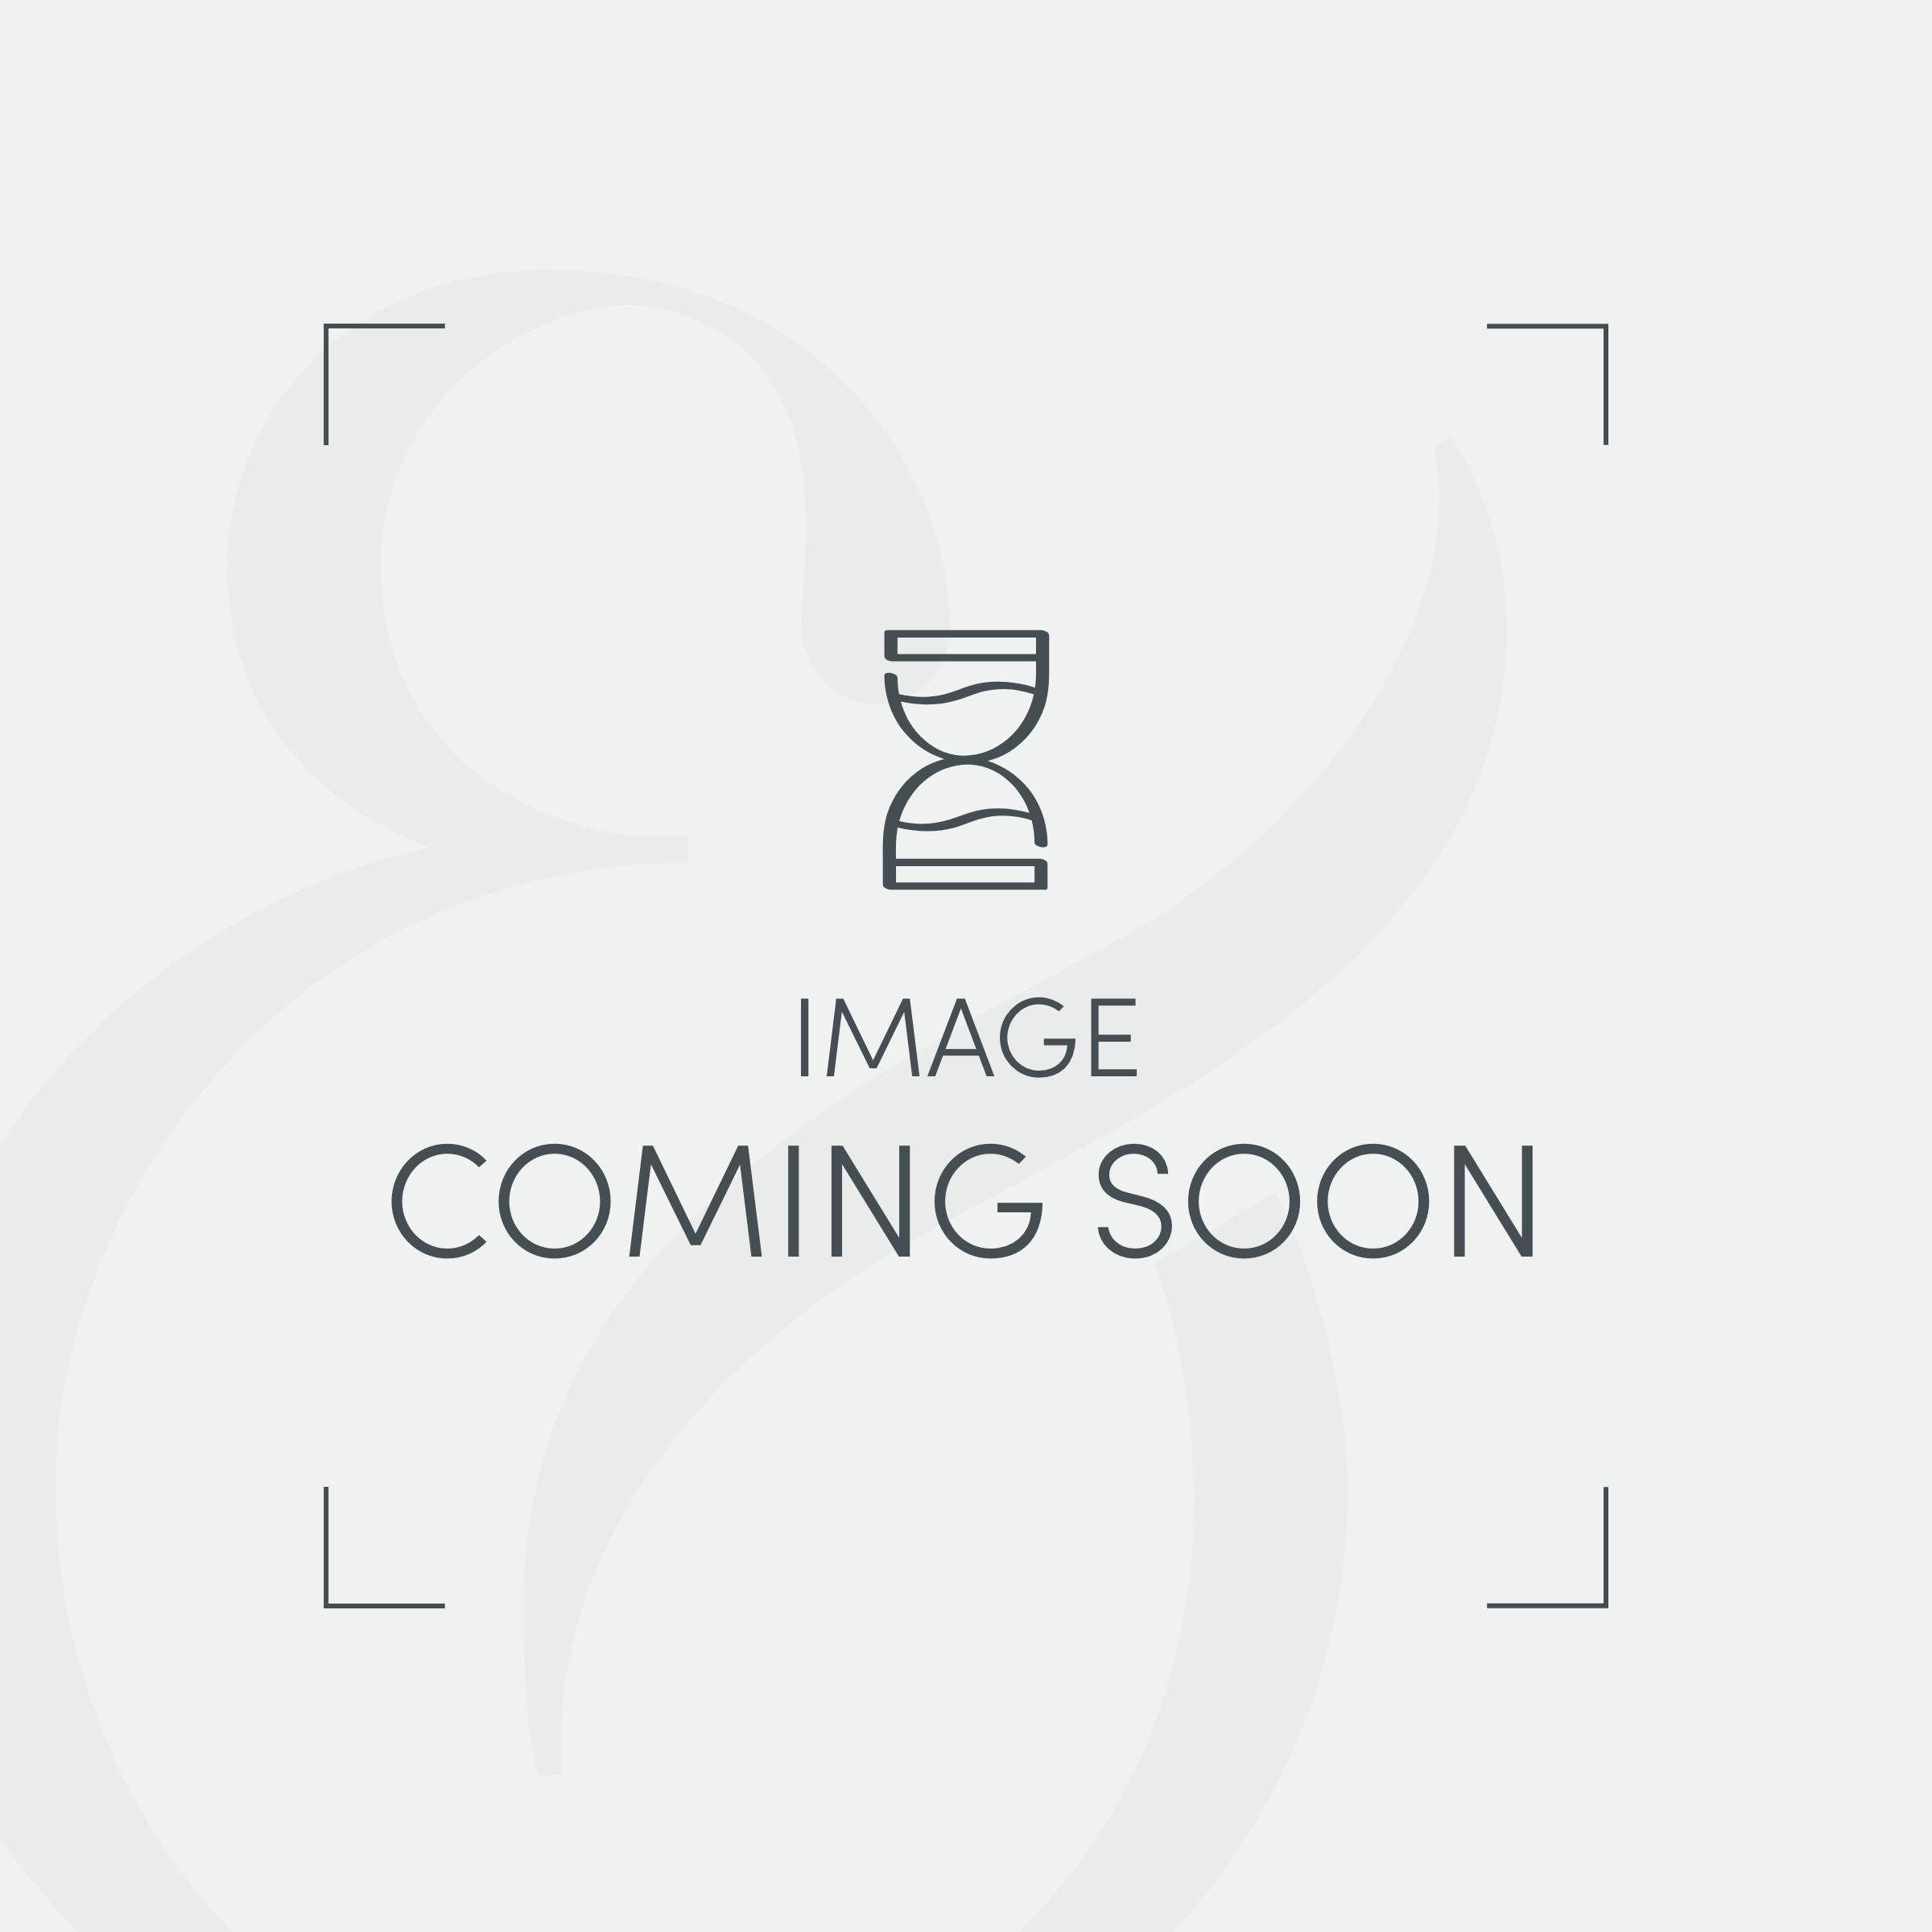 Comfort 1000 Pocket Spring Mattress - 200cm Length Zip & Link - Medium/Firm